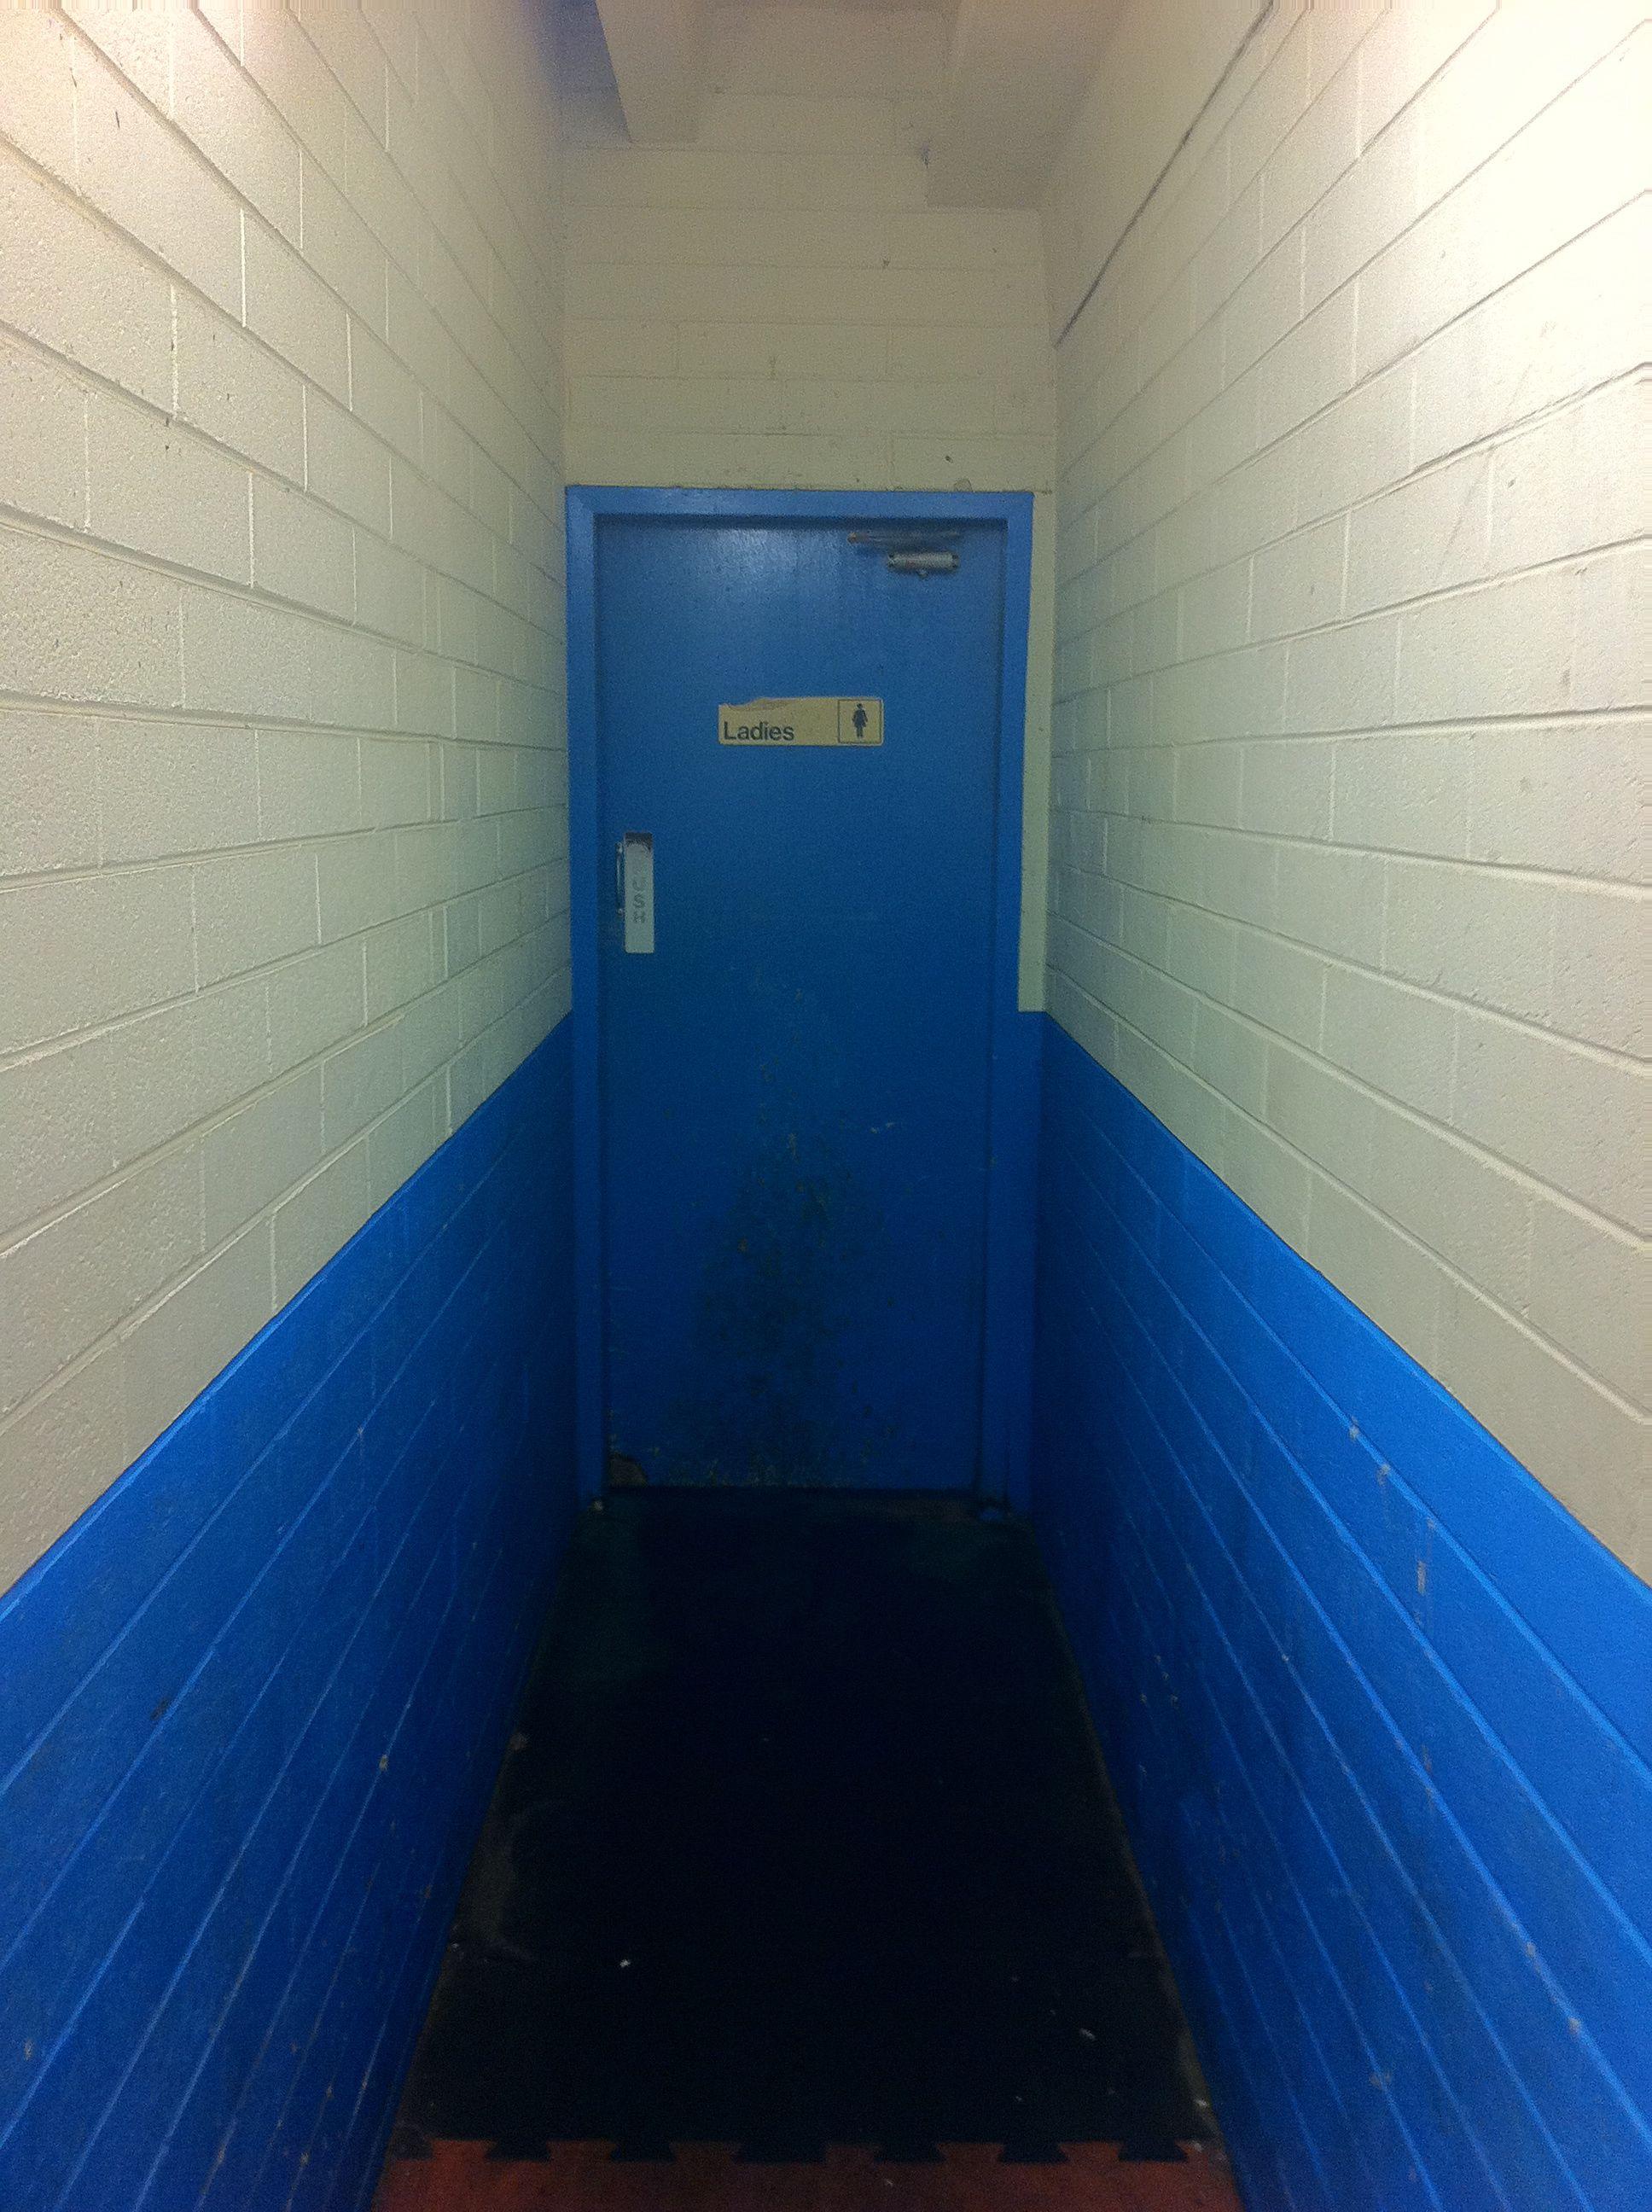 Hallway leading to the ladies rooms - Bathroom Hallway To Toilet But Black